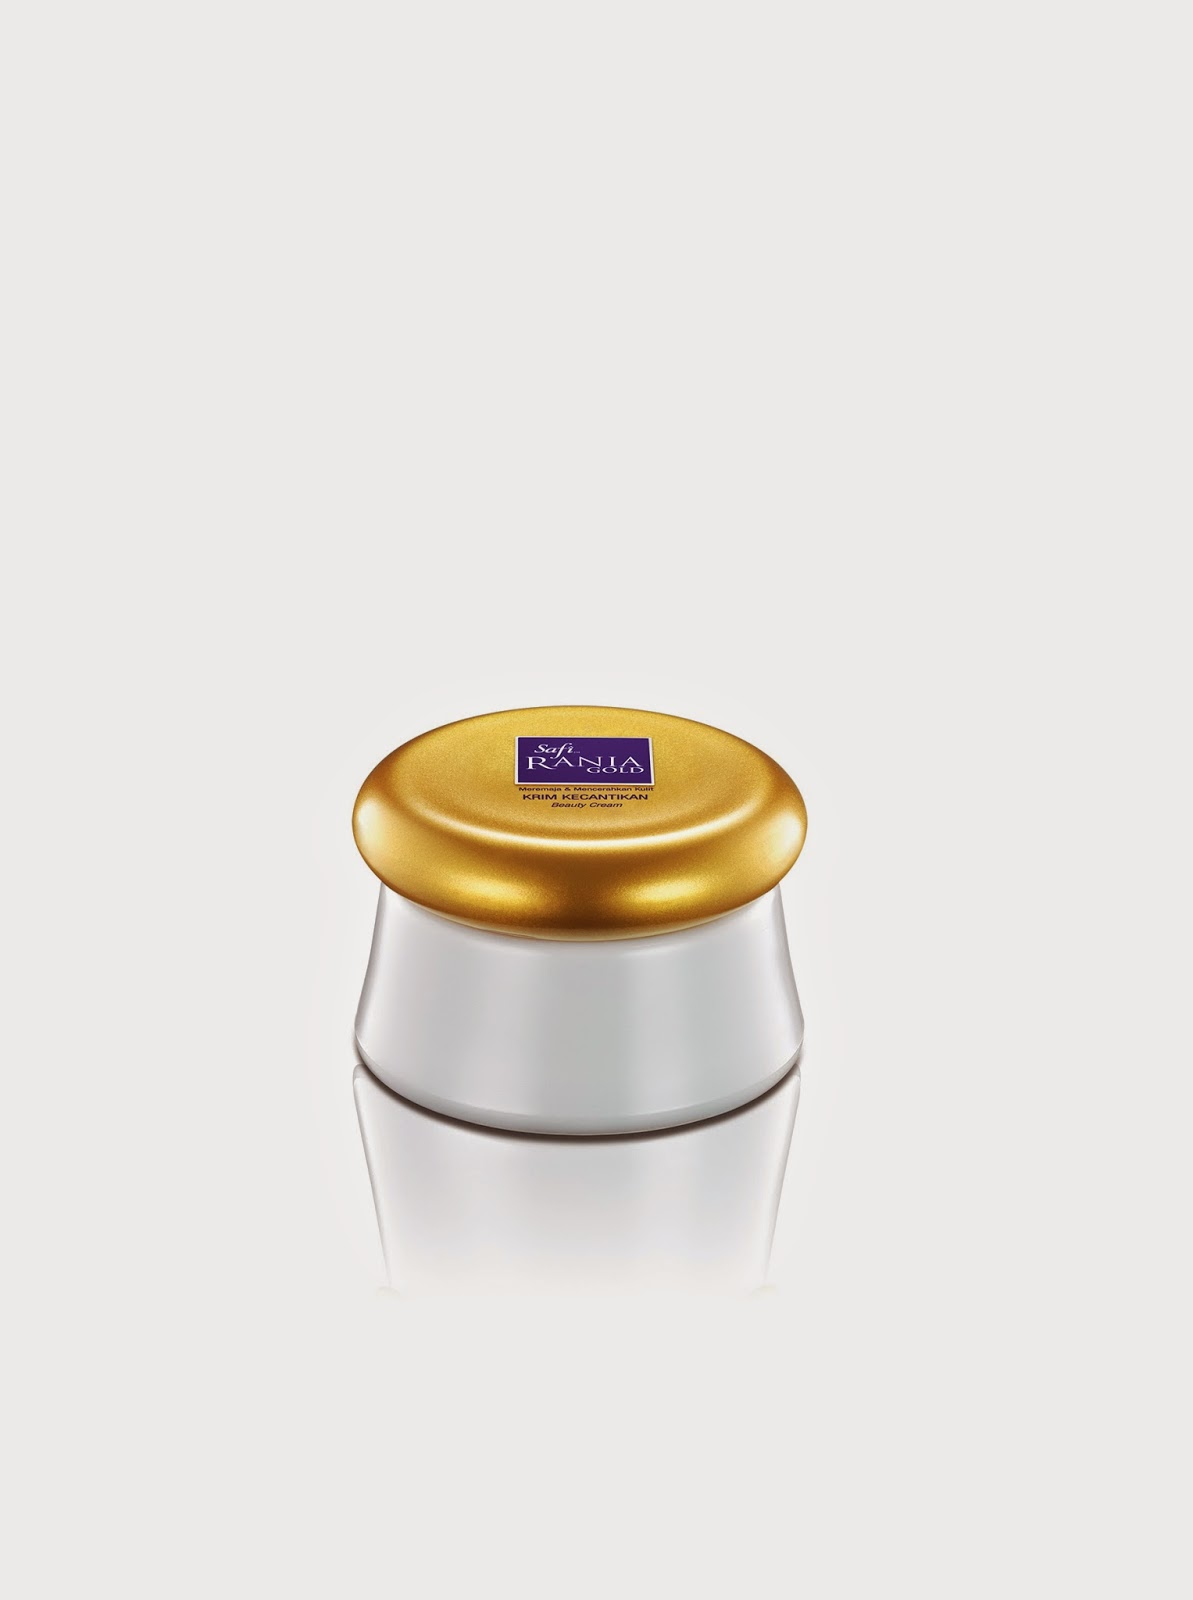 What Every Gal Want Safi Rania Gold Range Of Products Cream Pemutih Badan Body Krim Kecantikan Menyamaratakan Tona Kulit